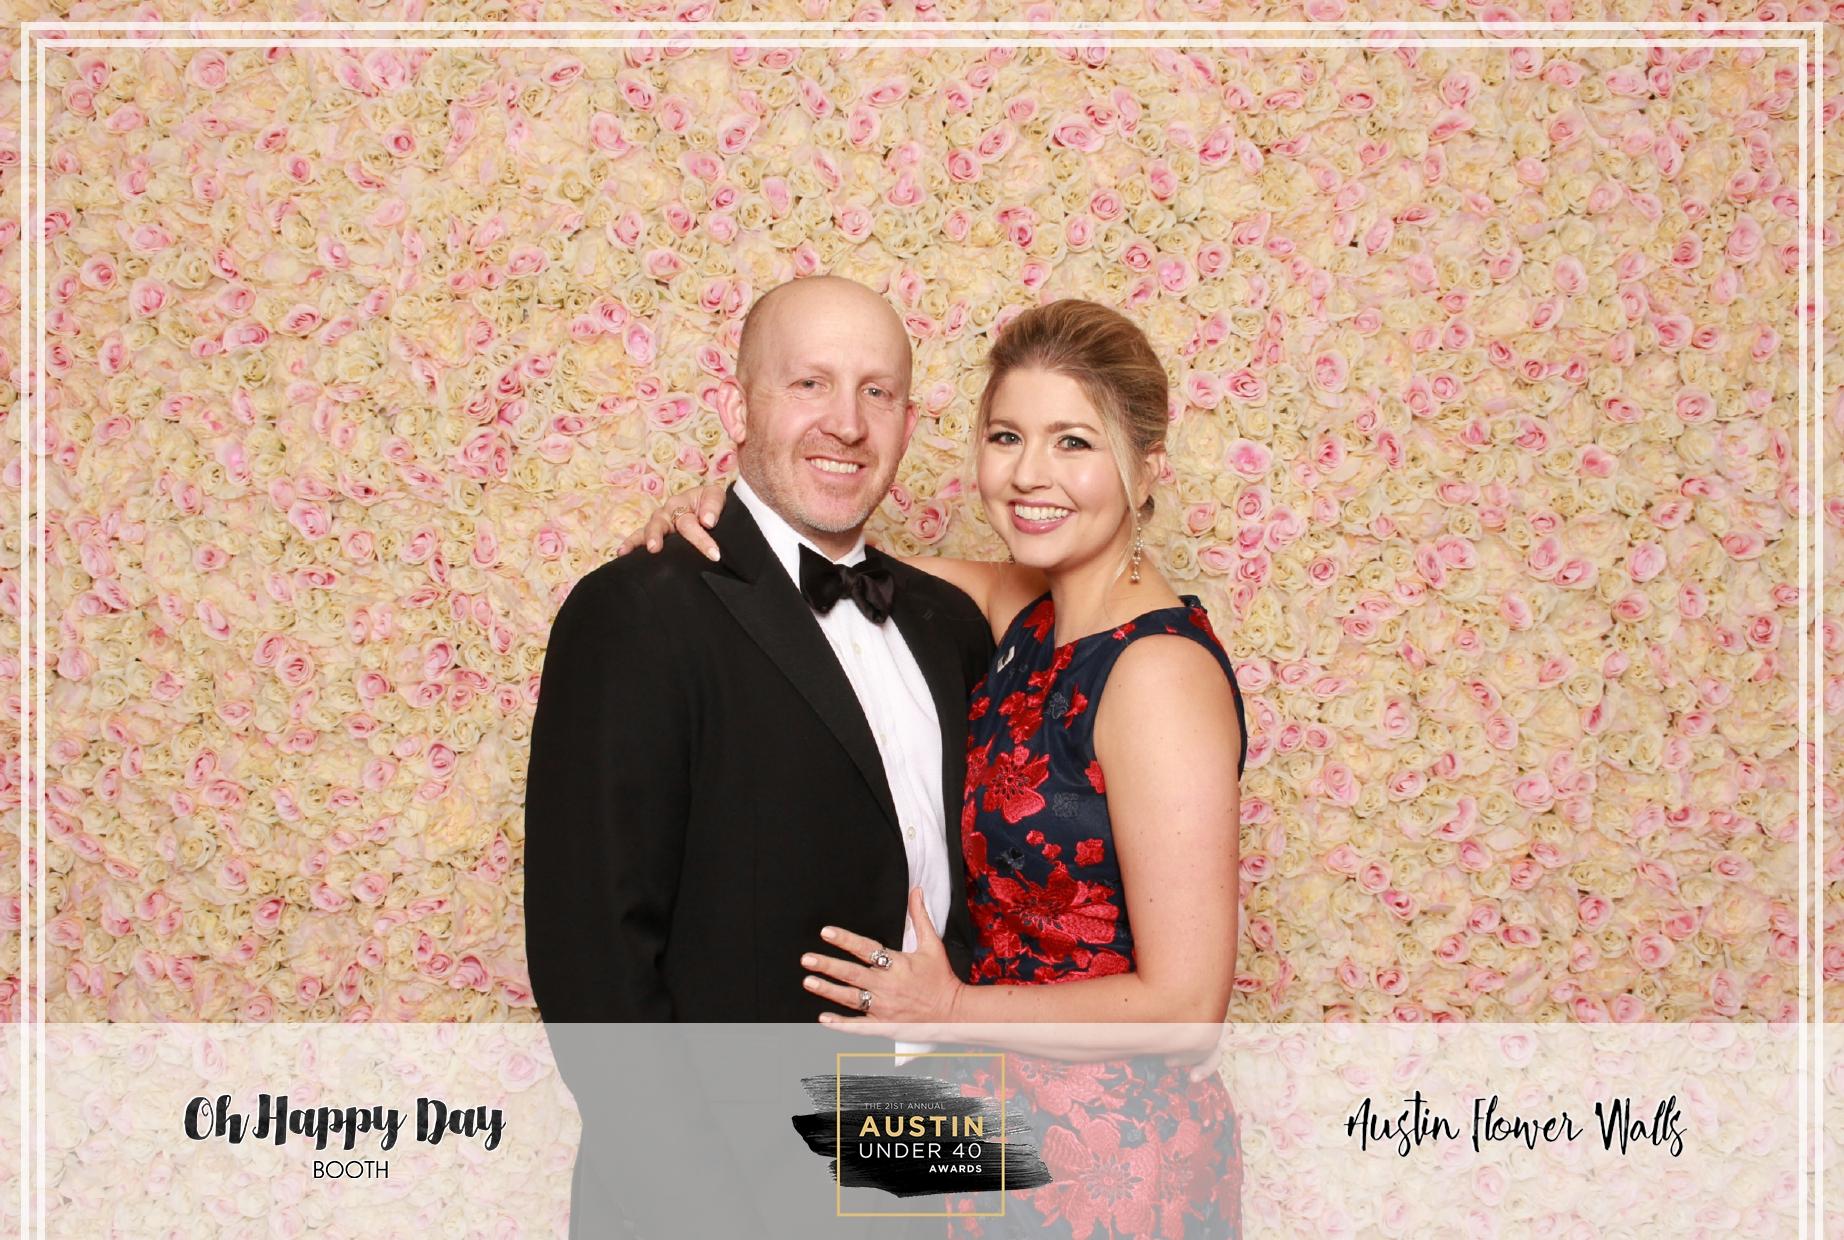 Oh Happy Day Booth - Austin Under 40-46.jpg